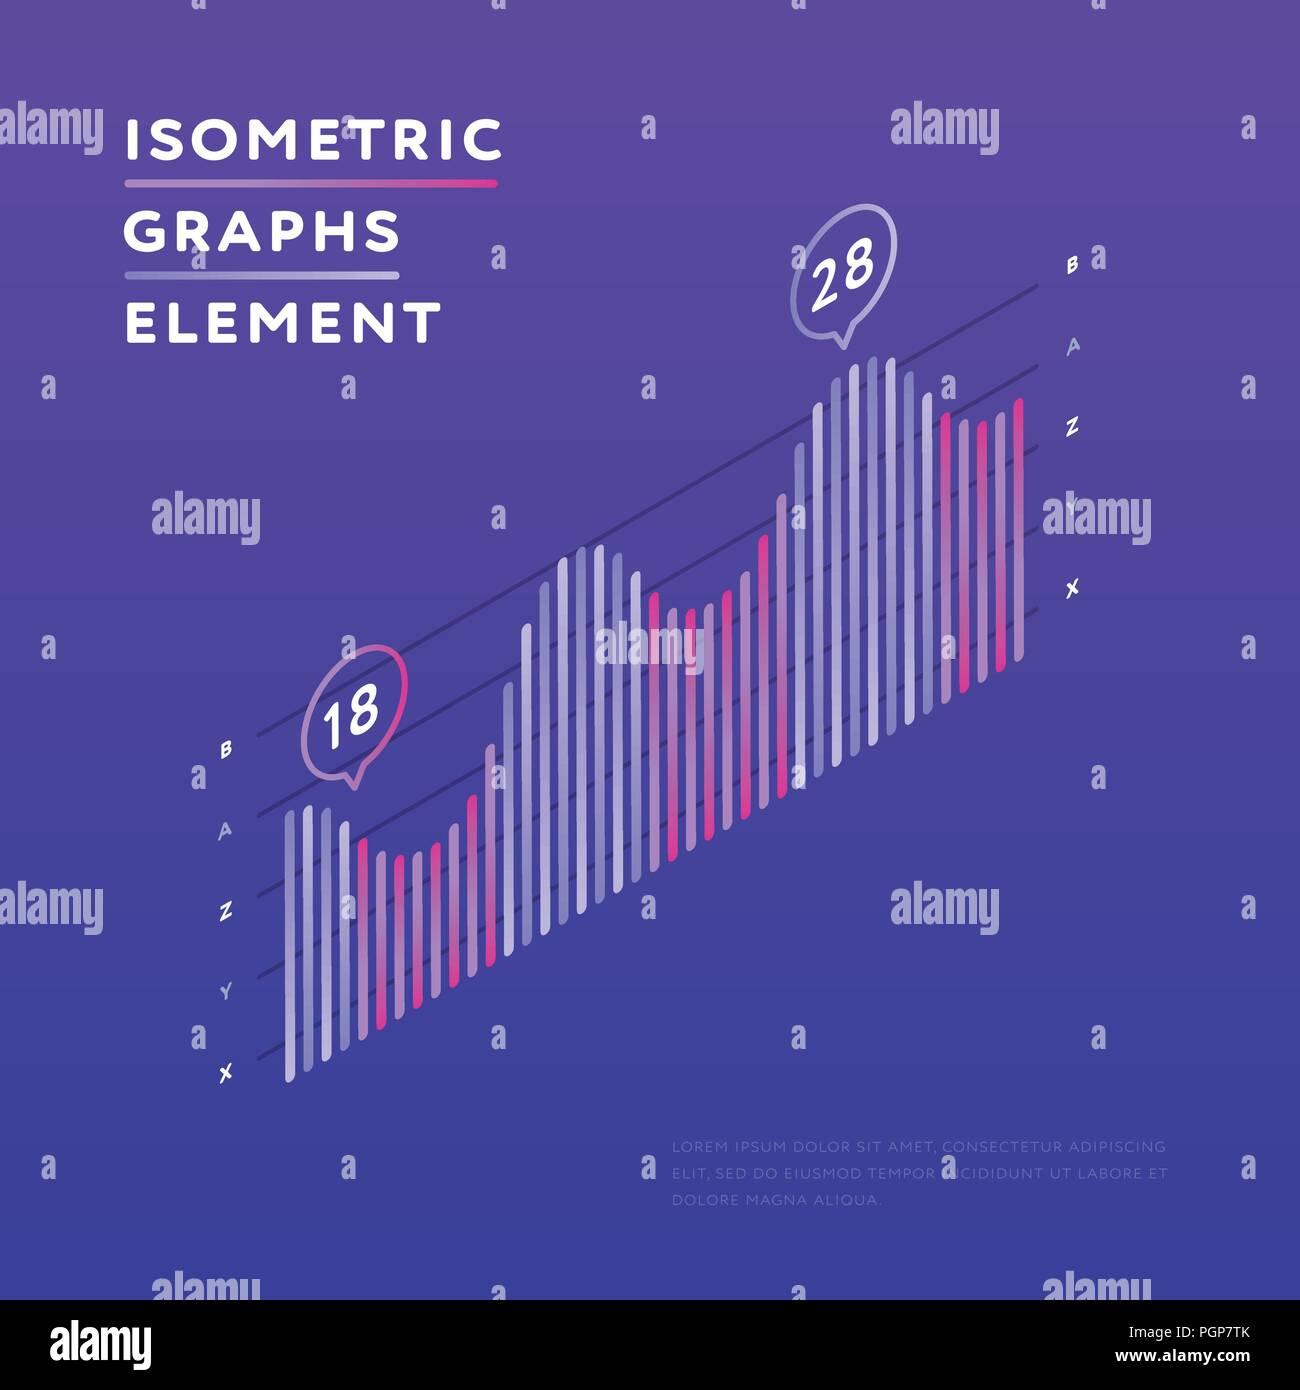 Isometric chart showing statistics - Stock Image